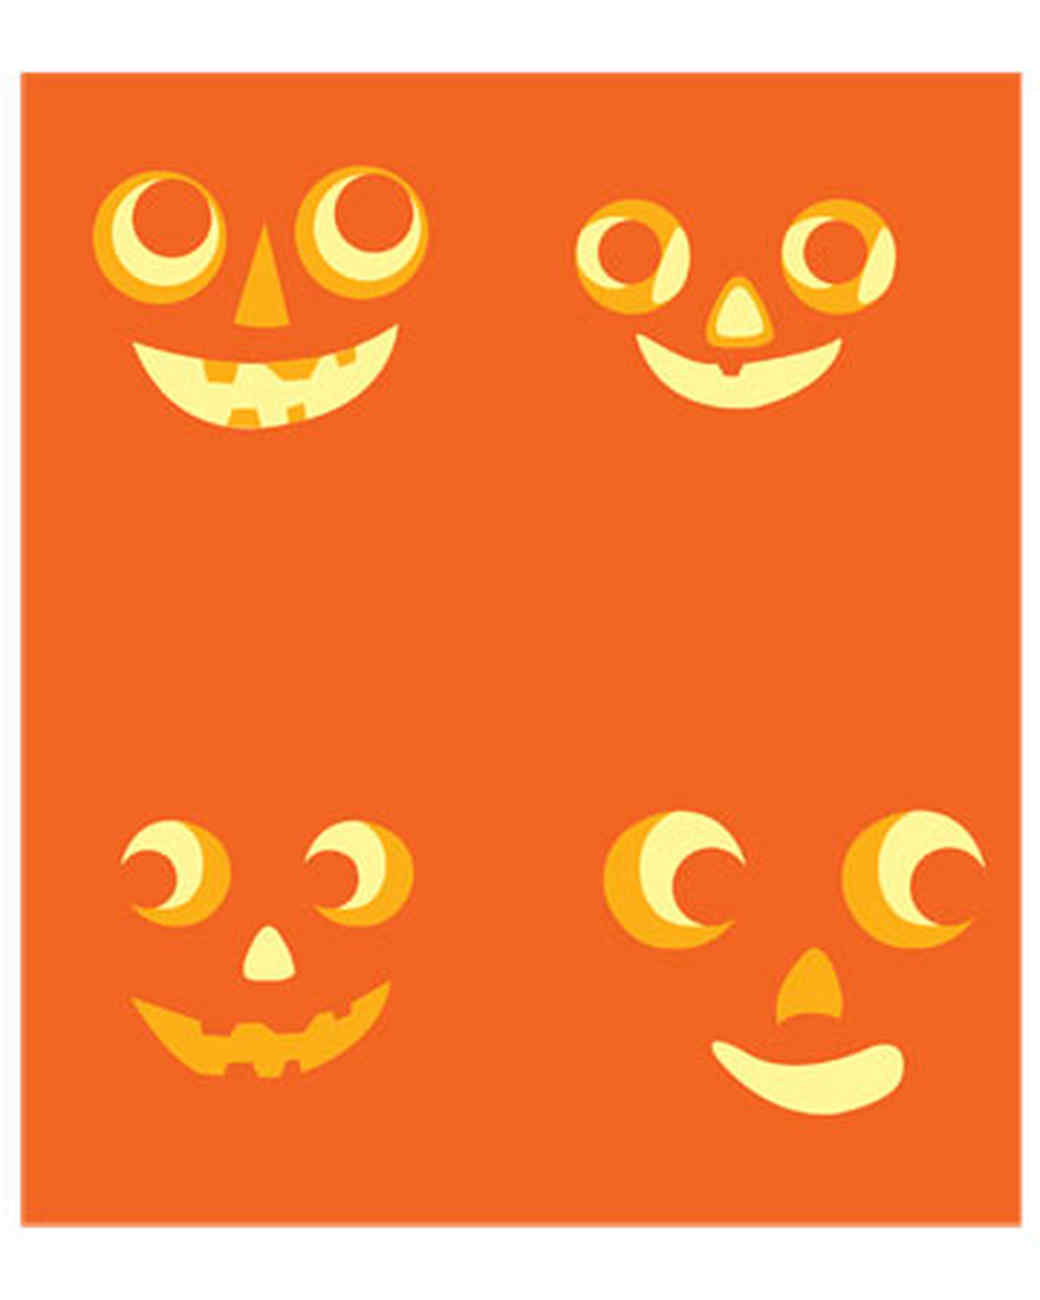 msl_1010_pumpkin_carving_templates_03_image.jpg